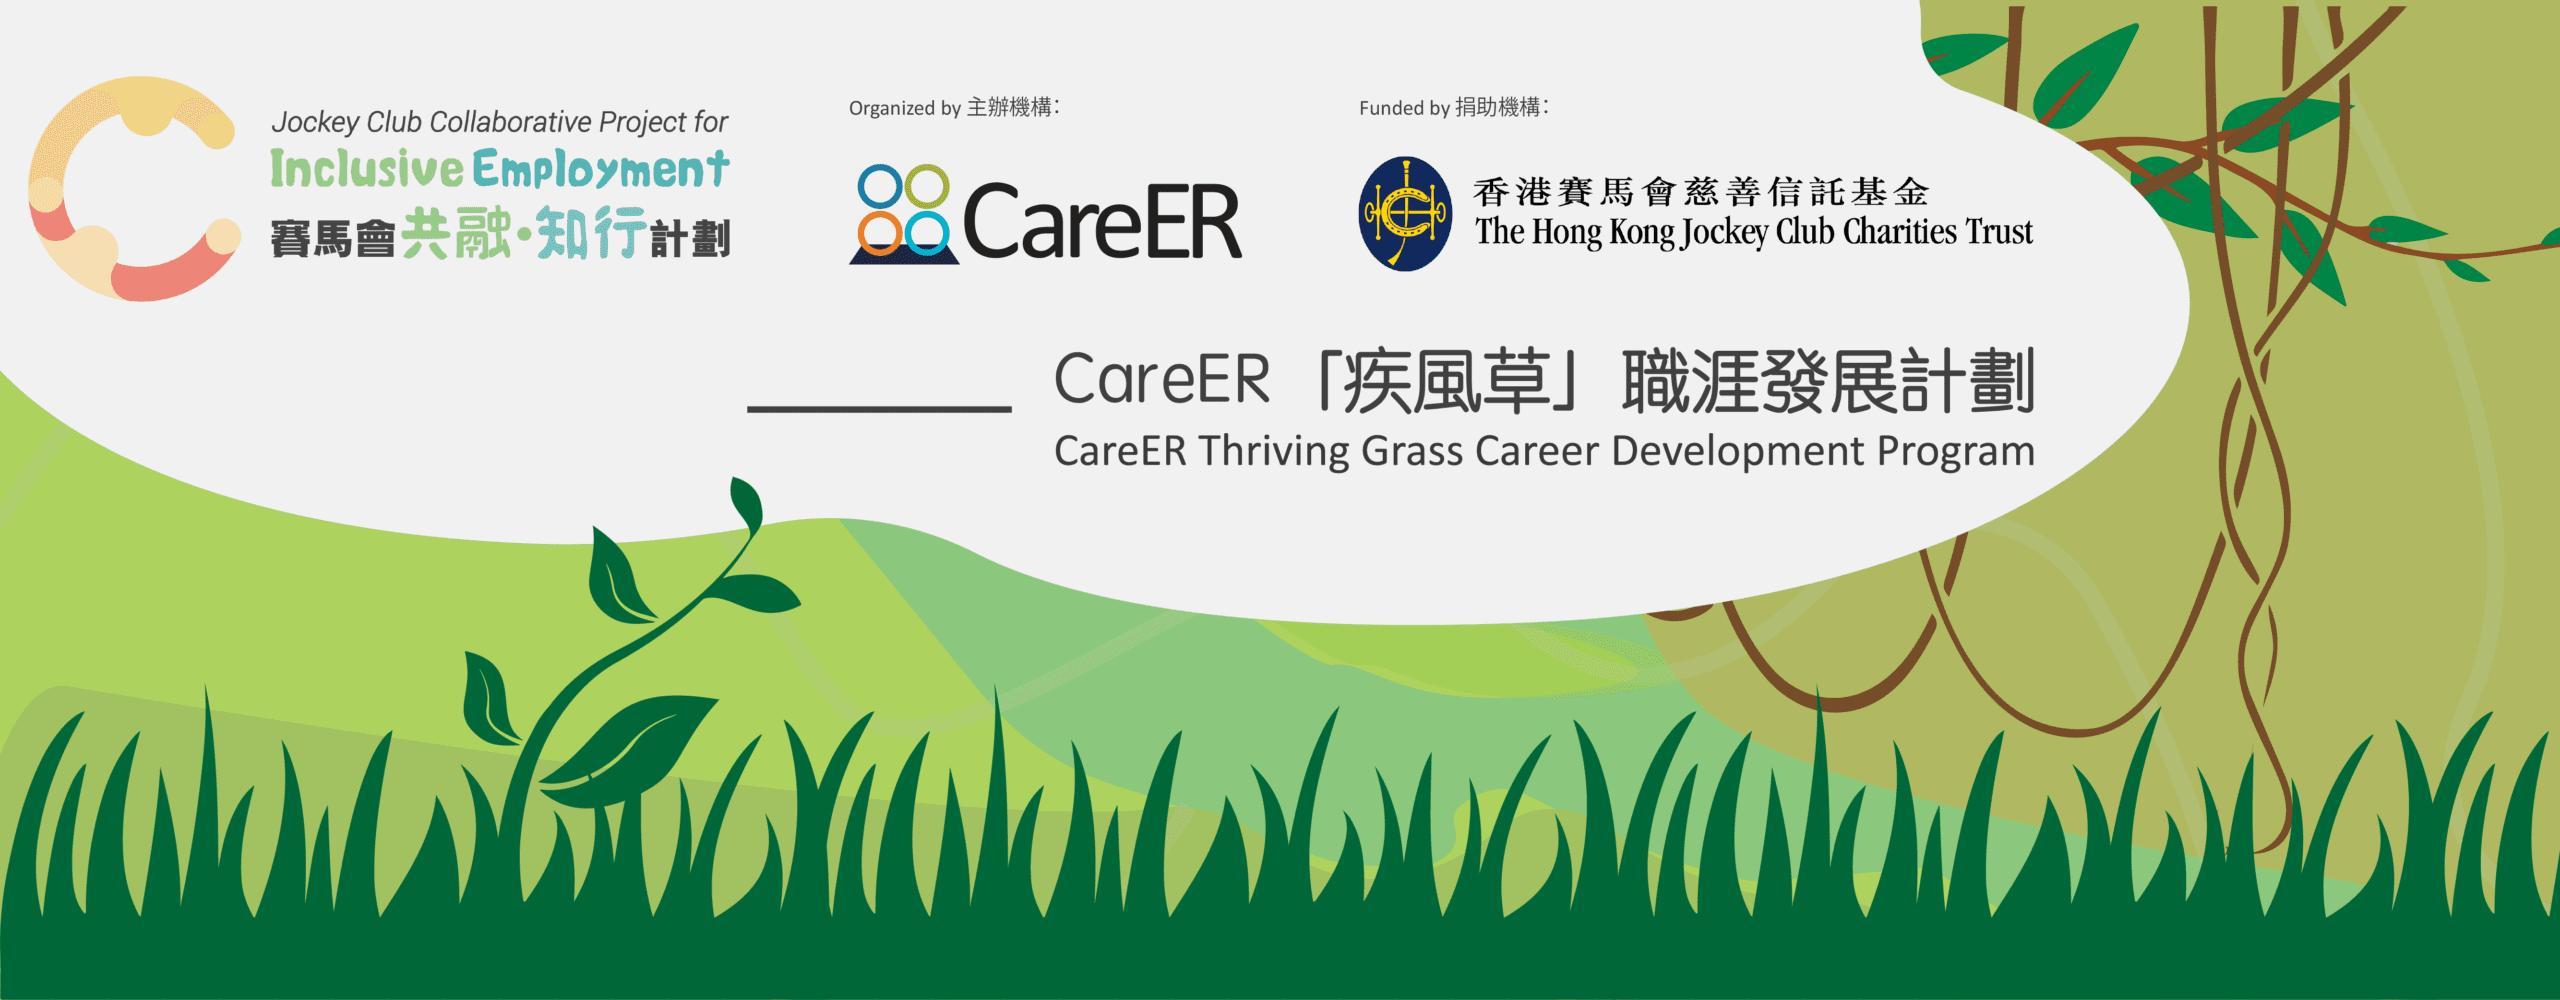 Jockey Club Collaborative Project for Inclusive Employment CareER Thriving Grass Career Development Program